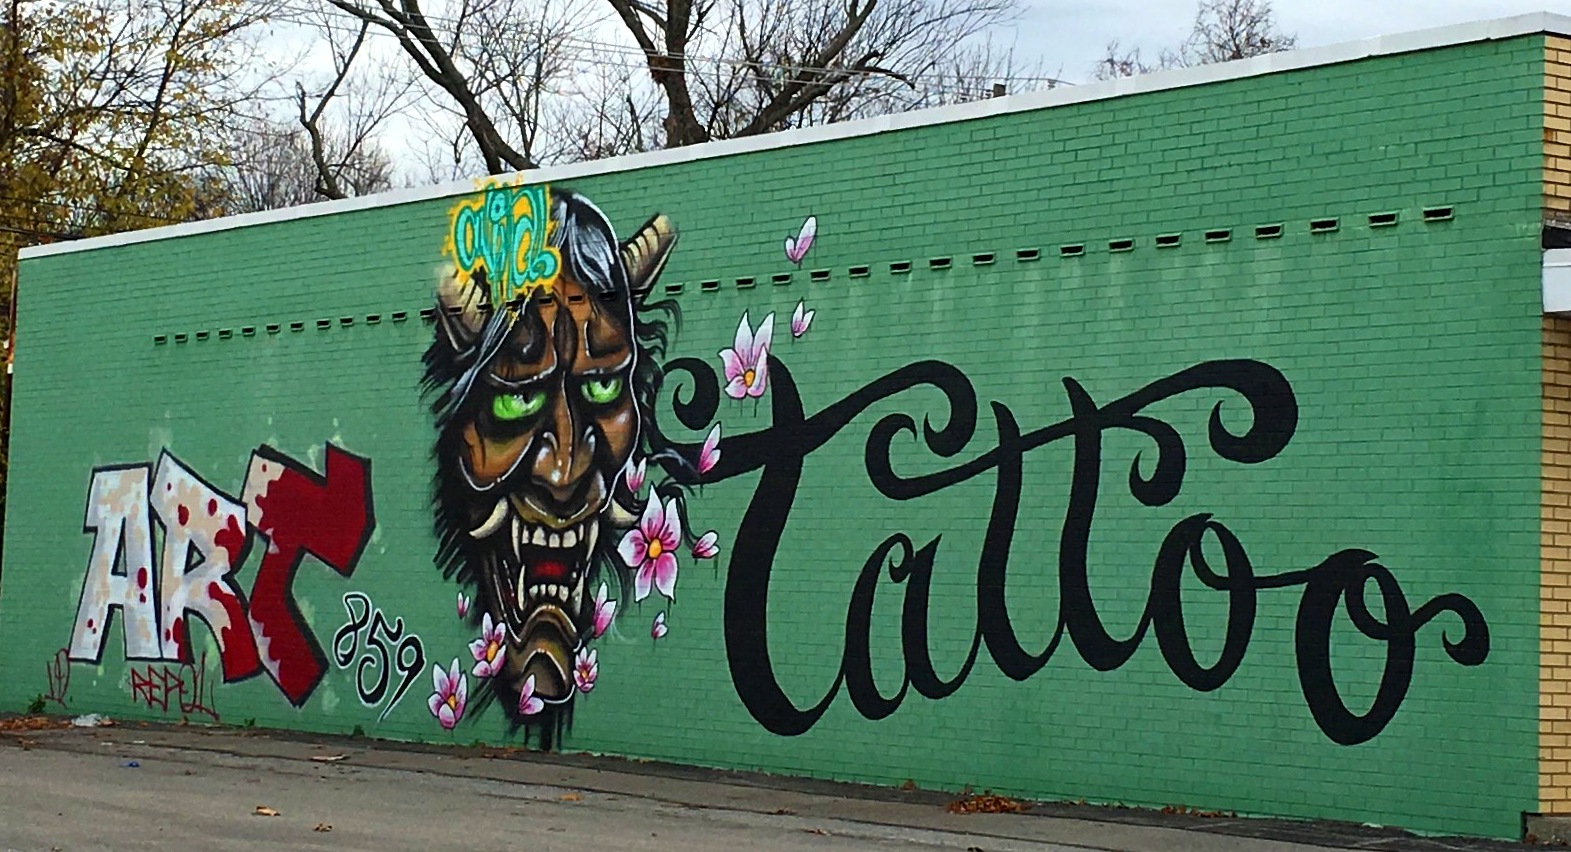 Graffiti wall tattoo - Graffiti Wall Tattoo 55